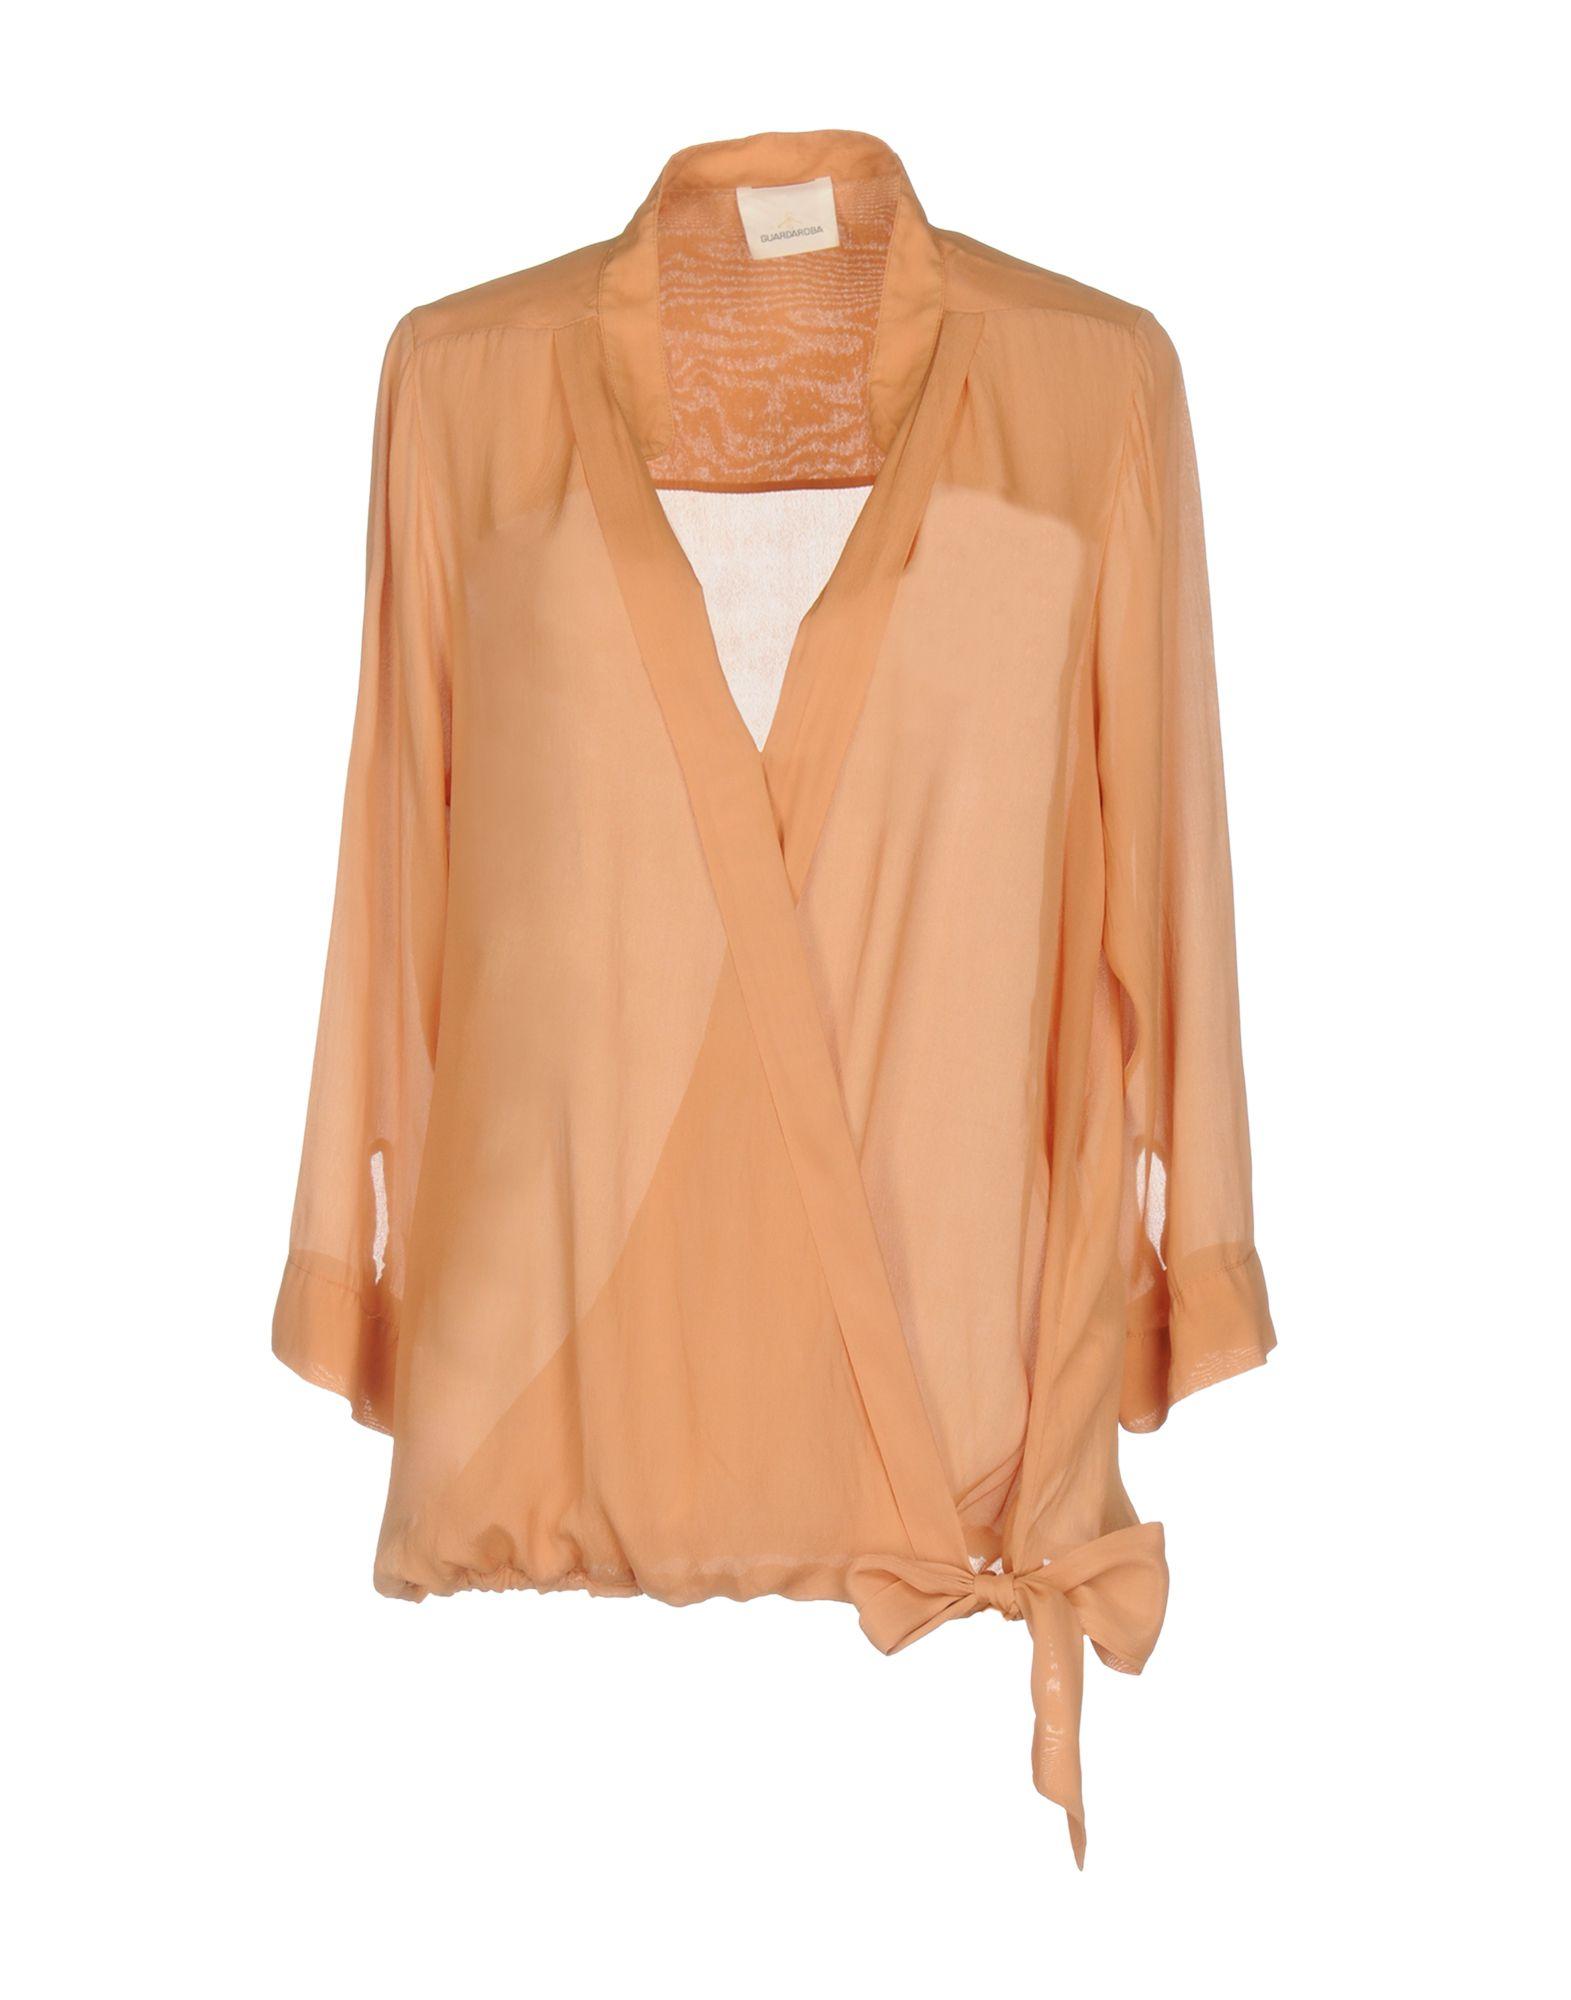 GUARDAROBA by ANIYE BY Damen Bluse Farbe Pfirsich Größe 4